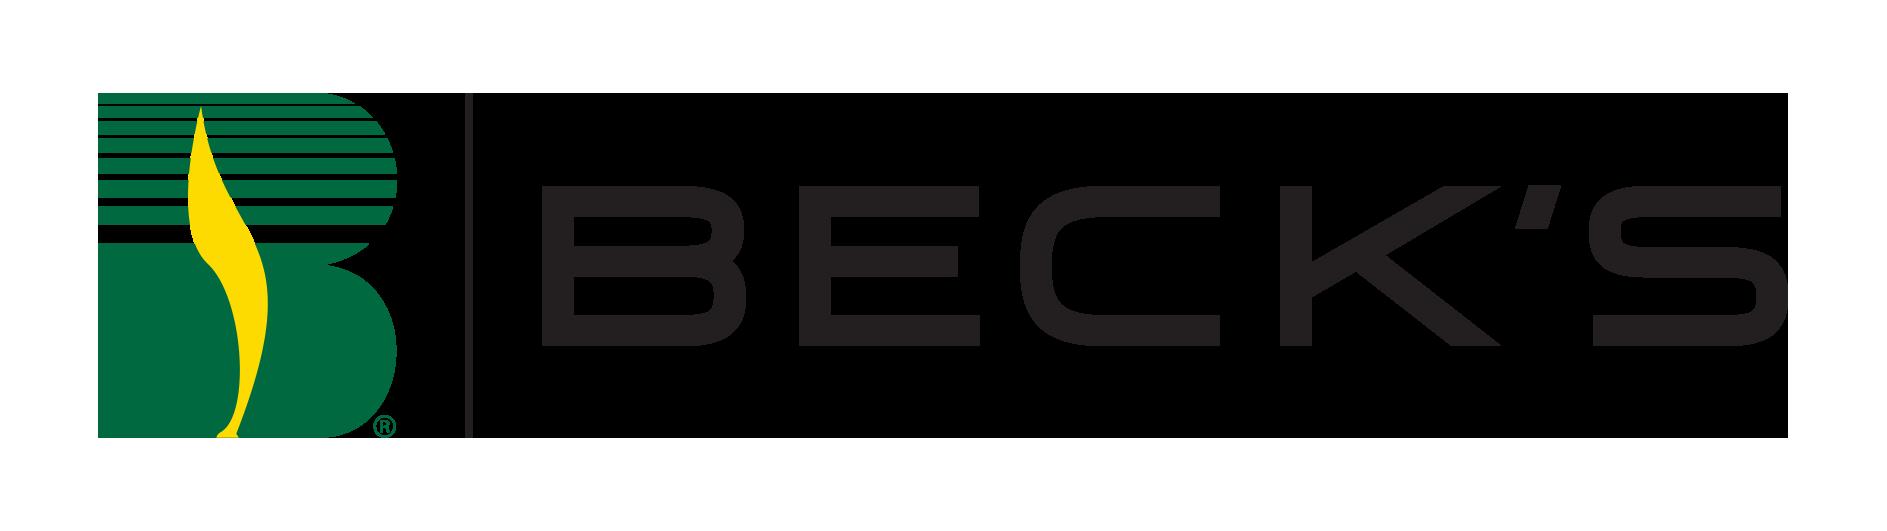 Becks_Logo_2_Horizontal_D_FullColor.png